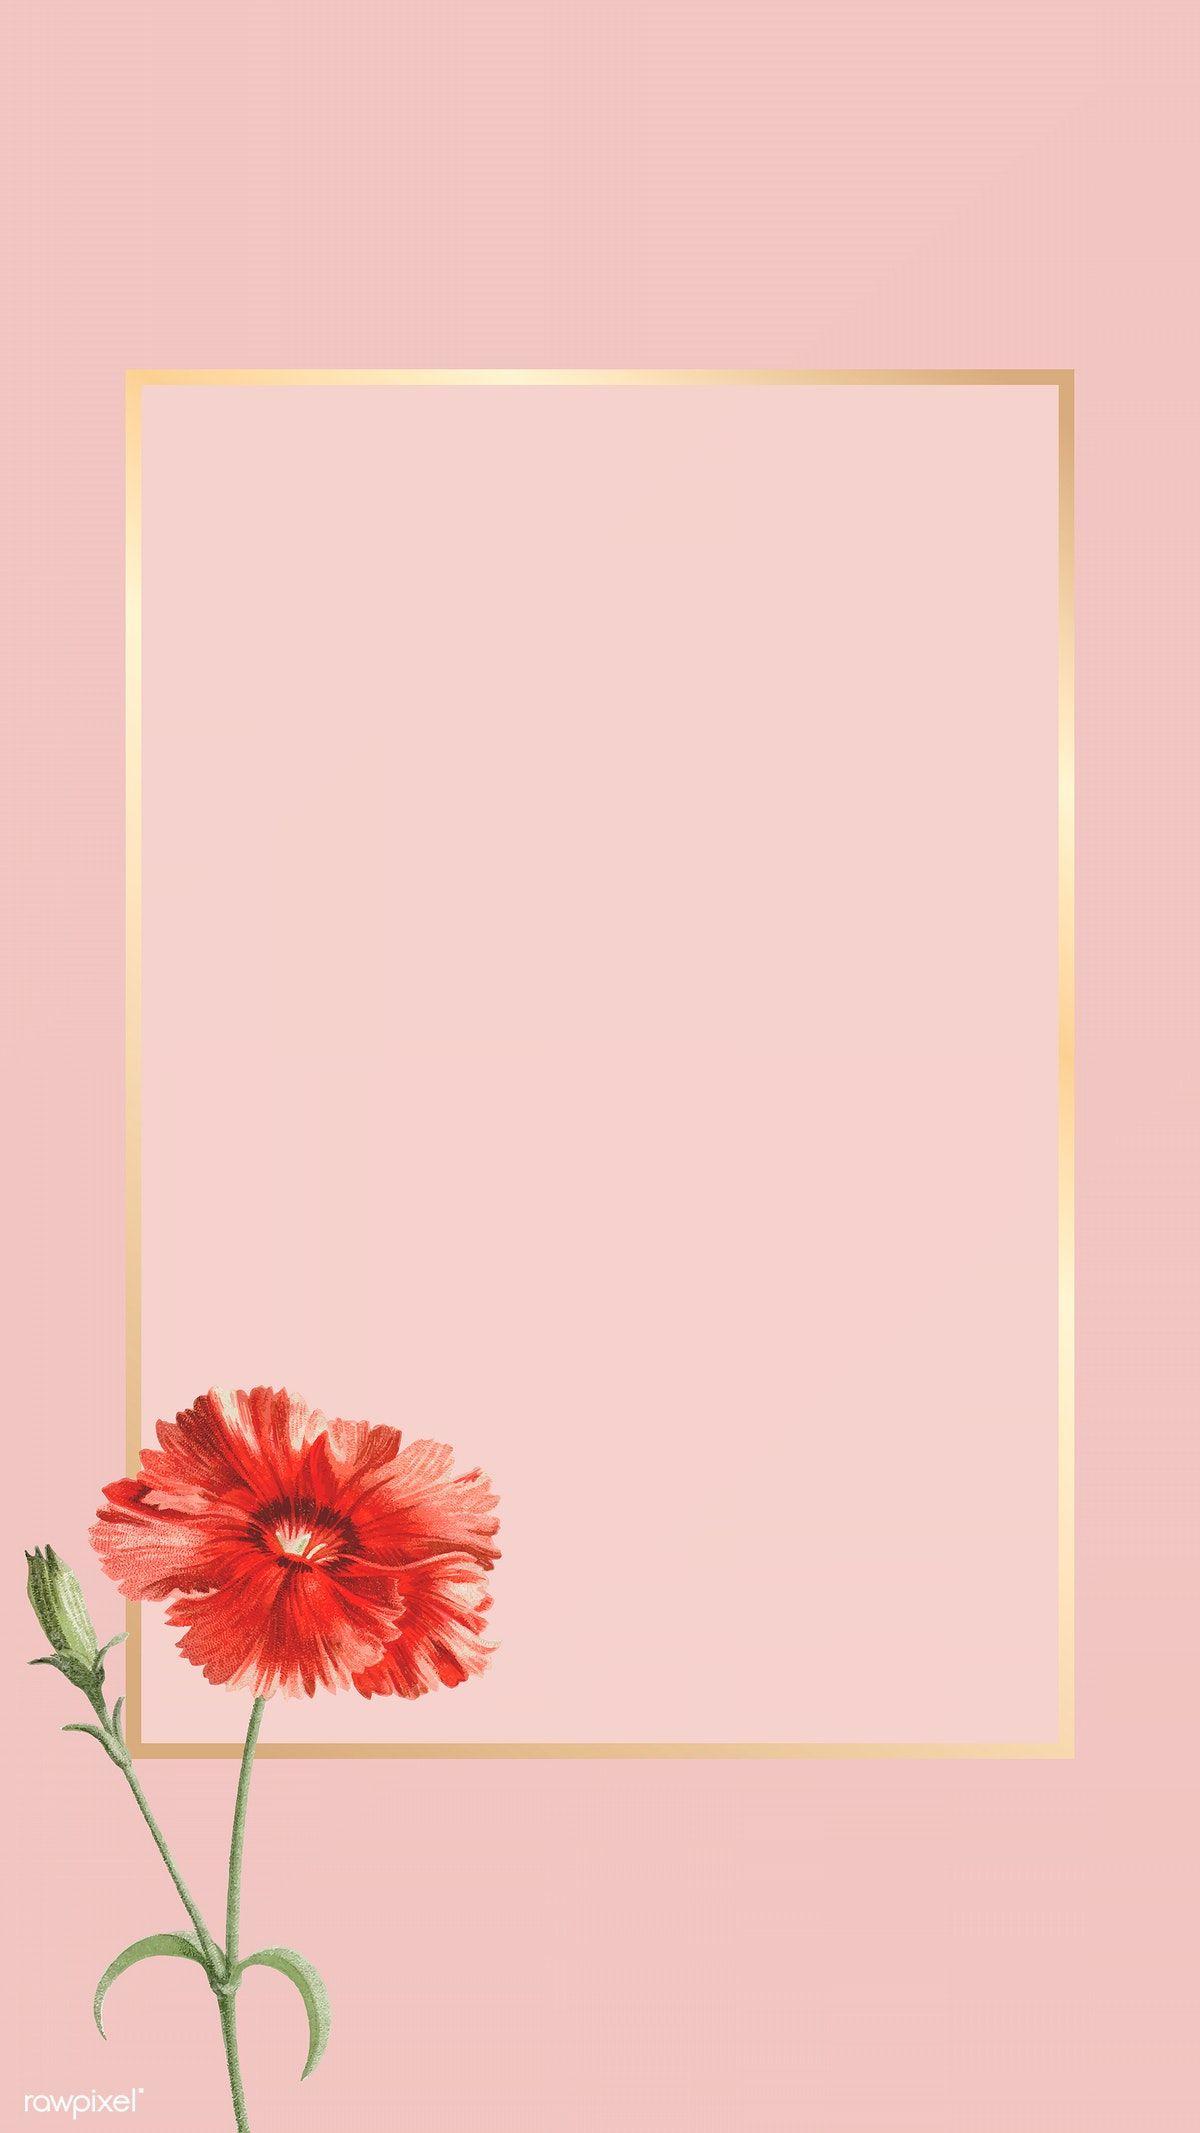 Download premium vector of Orange carnation flower element